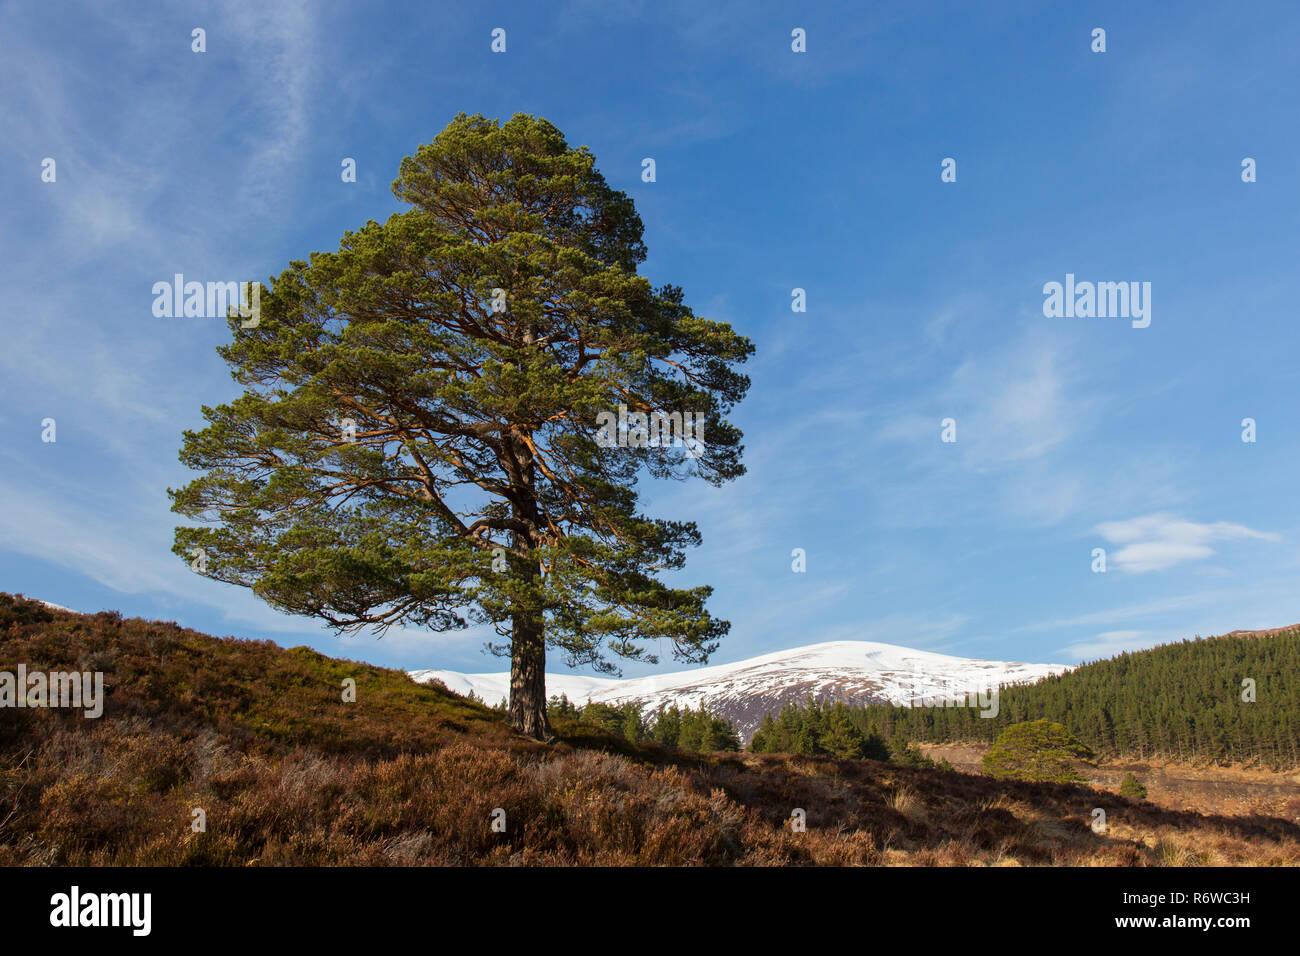 Solitary native Scots pine (Pinus sylvestris) in Glen Affric in winter, Inverness-shire, Scottish Highlands, Highland, Scotland, UK - Stock Image